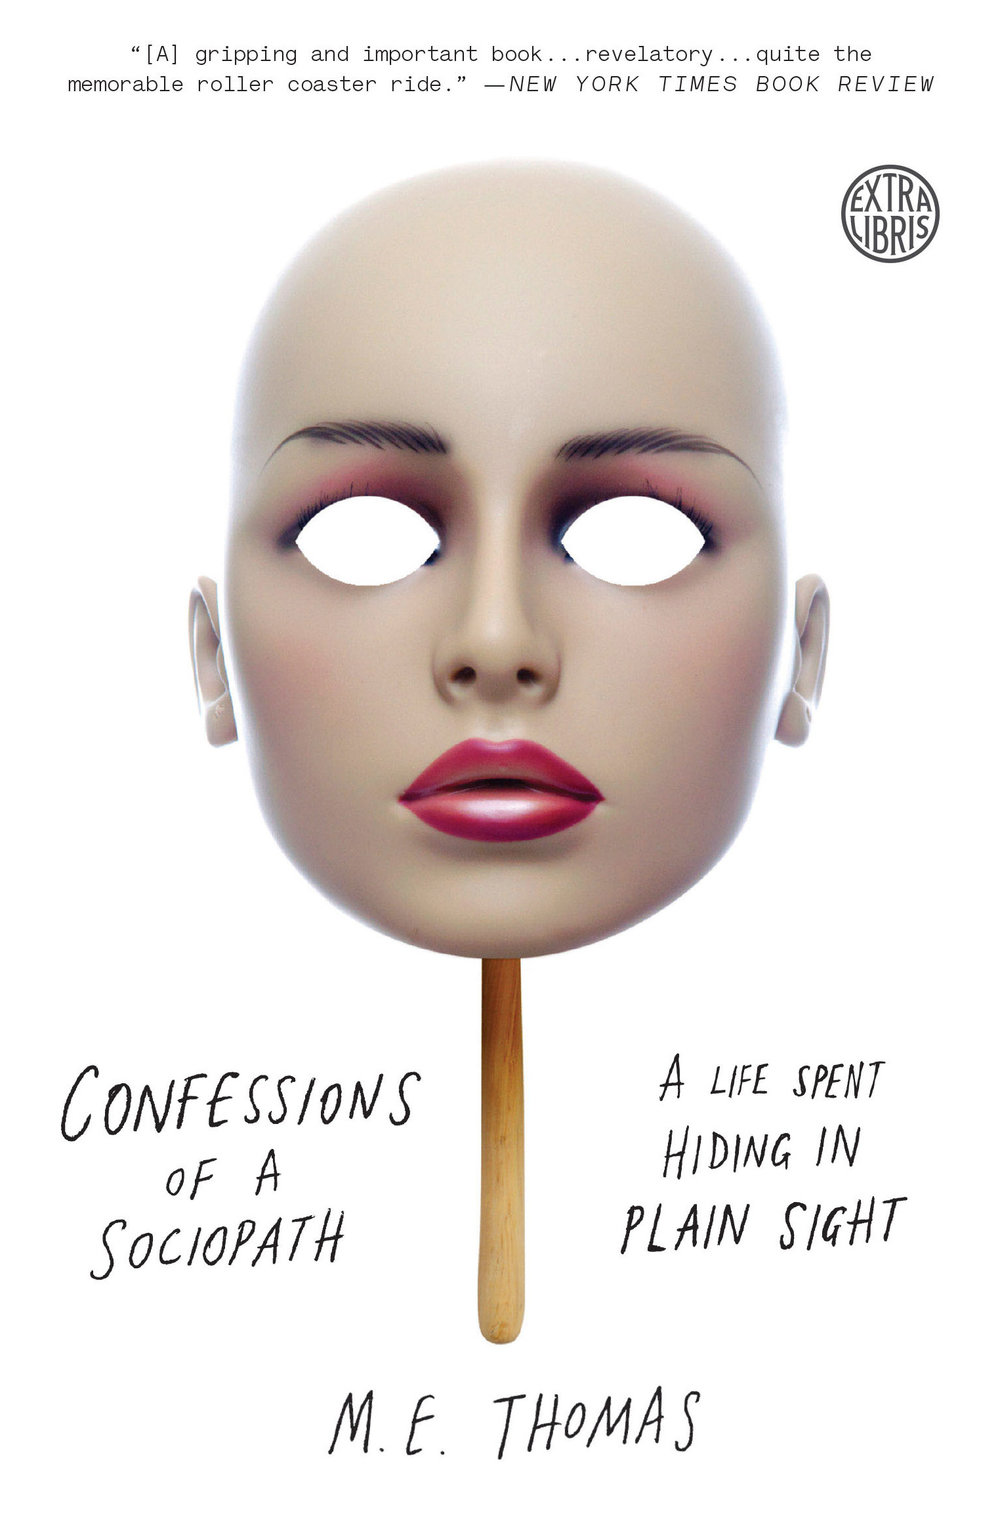 confessions-of-a-sociopath-m-e-thomas.jpg